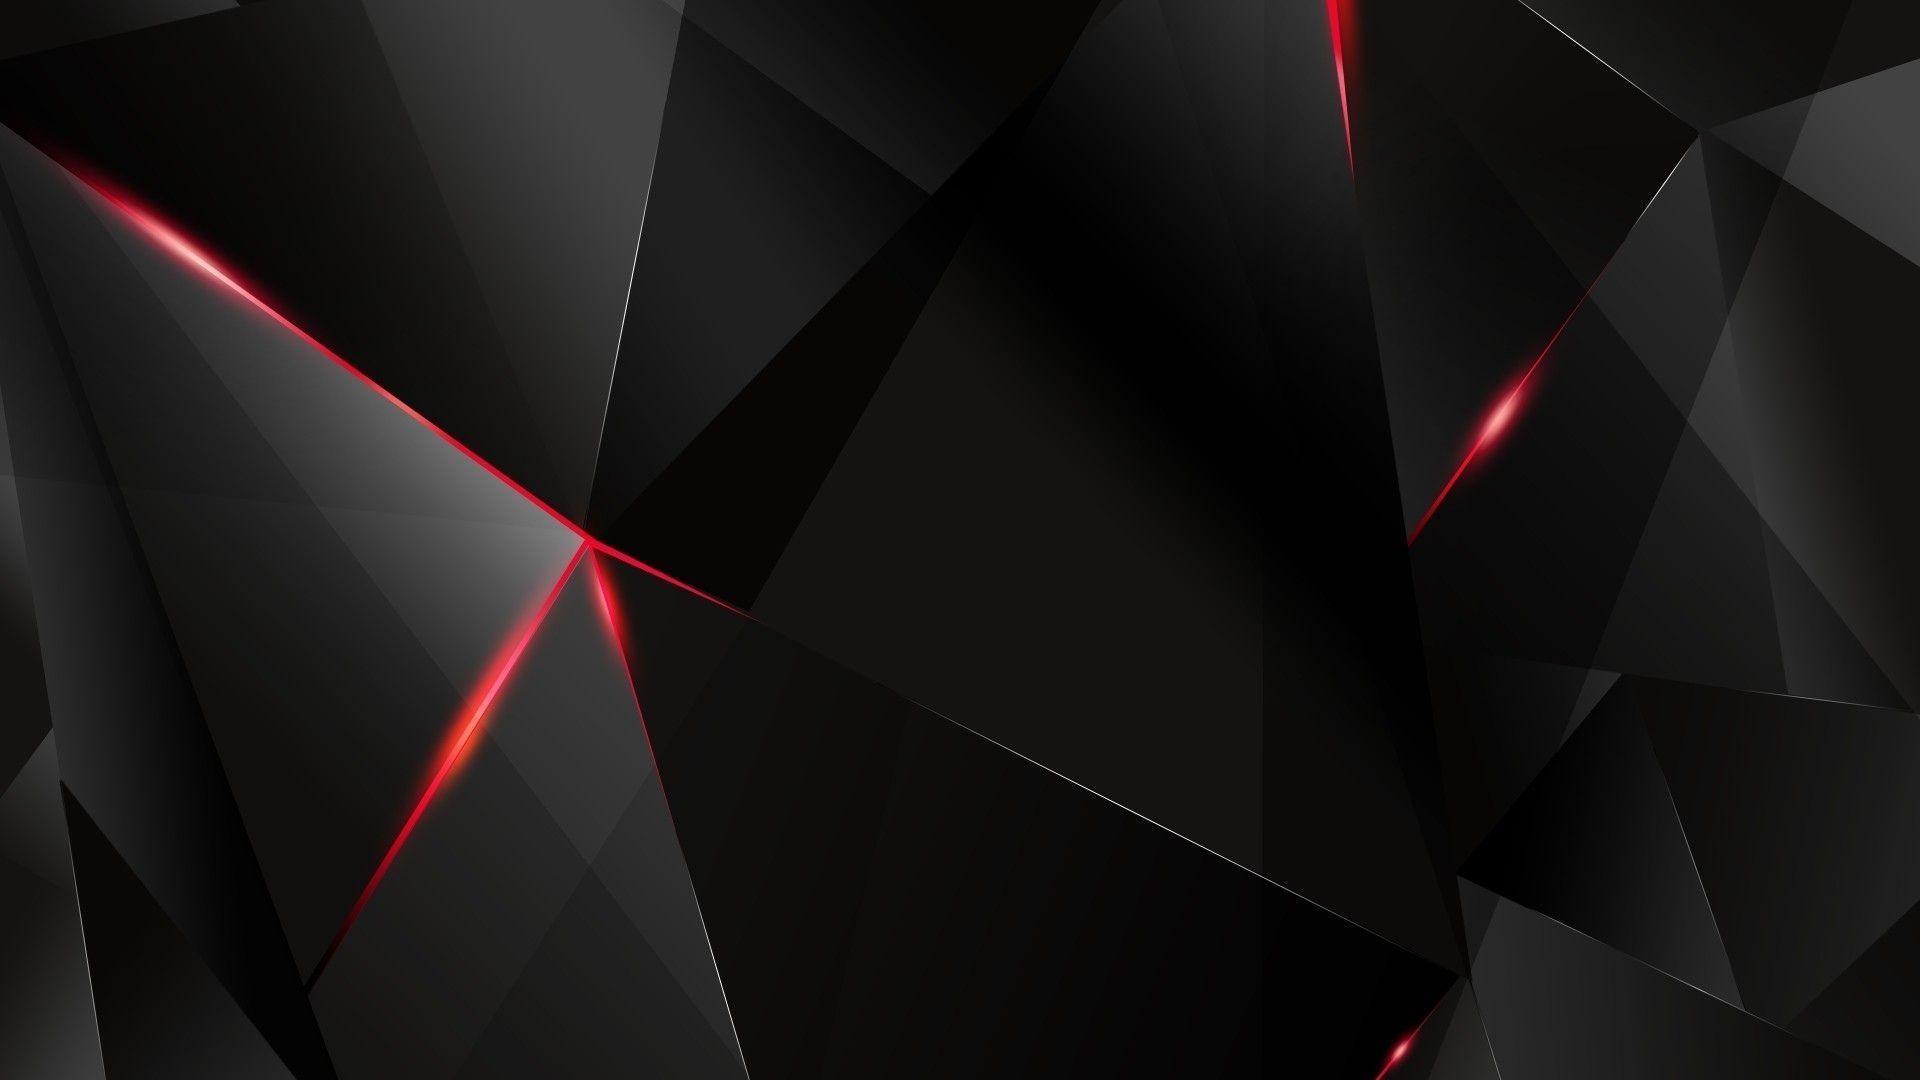 Full Hd 1080p Desktop Wallpapers Hd 1920x1080 Free Desktop Dark Black Wallpaper Dark Wallpaper Red And Black Wallpaper